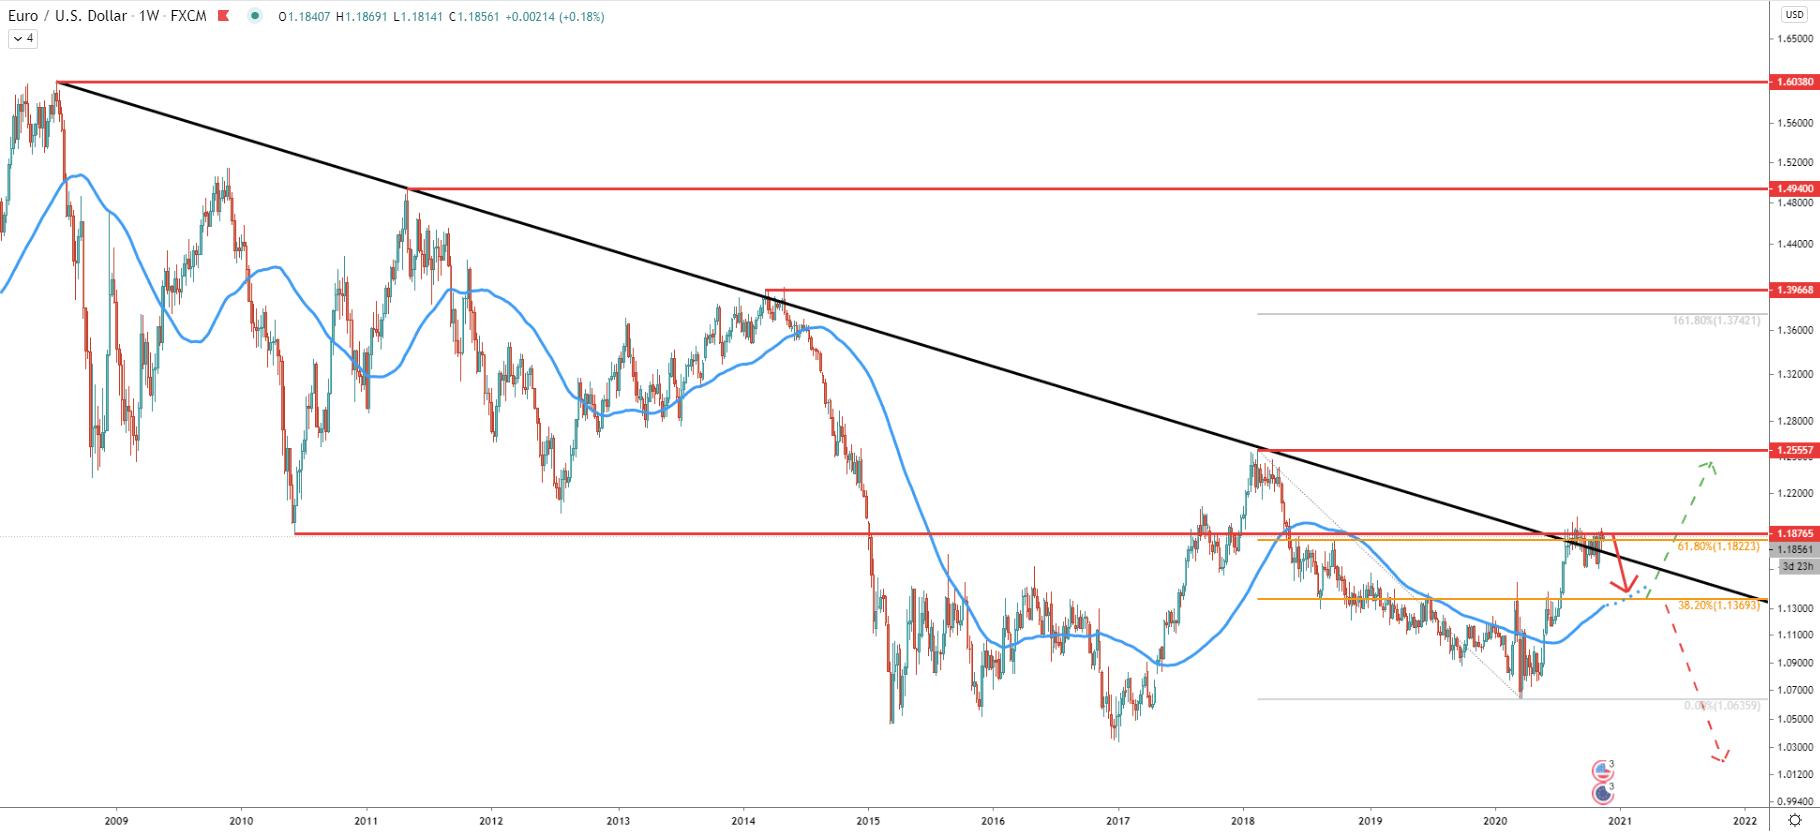 EUR/USD Weekly Technical Analysis 16 Nov 2020